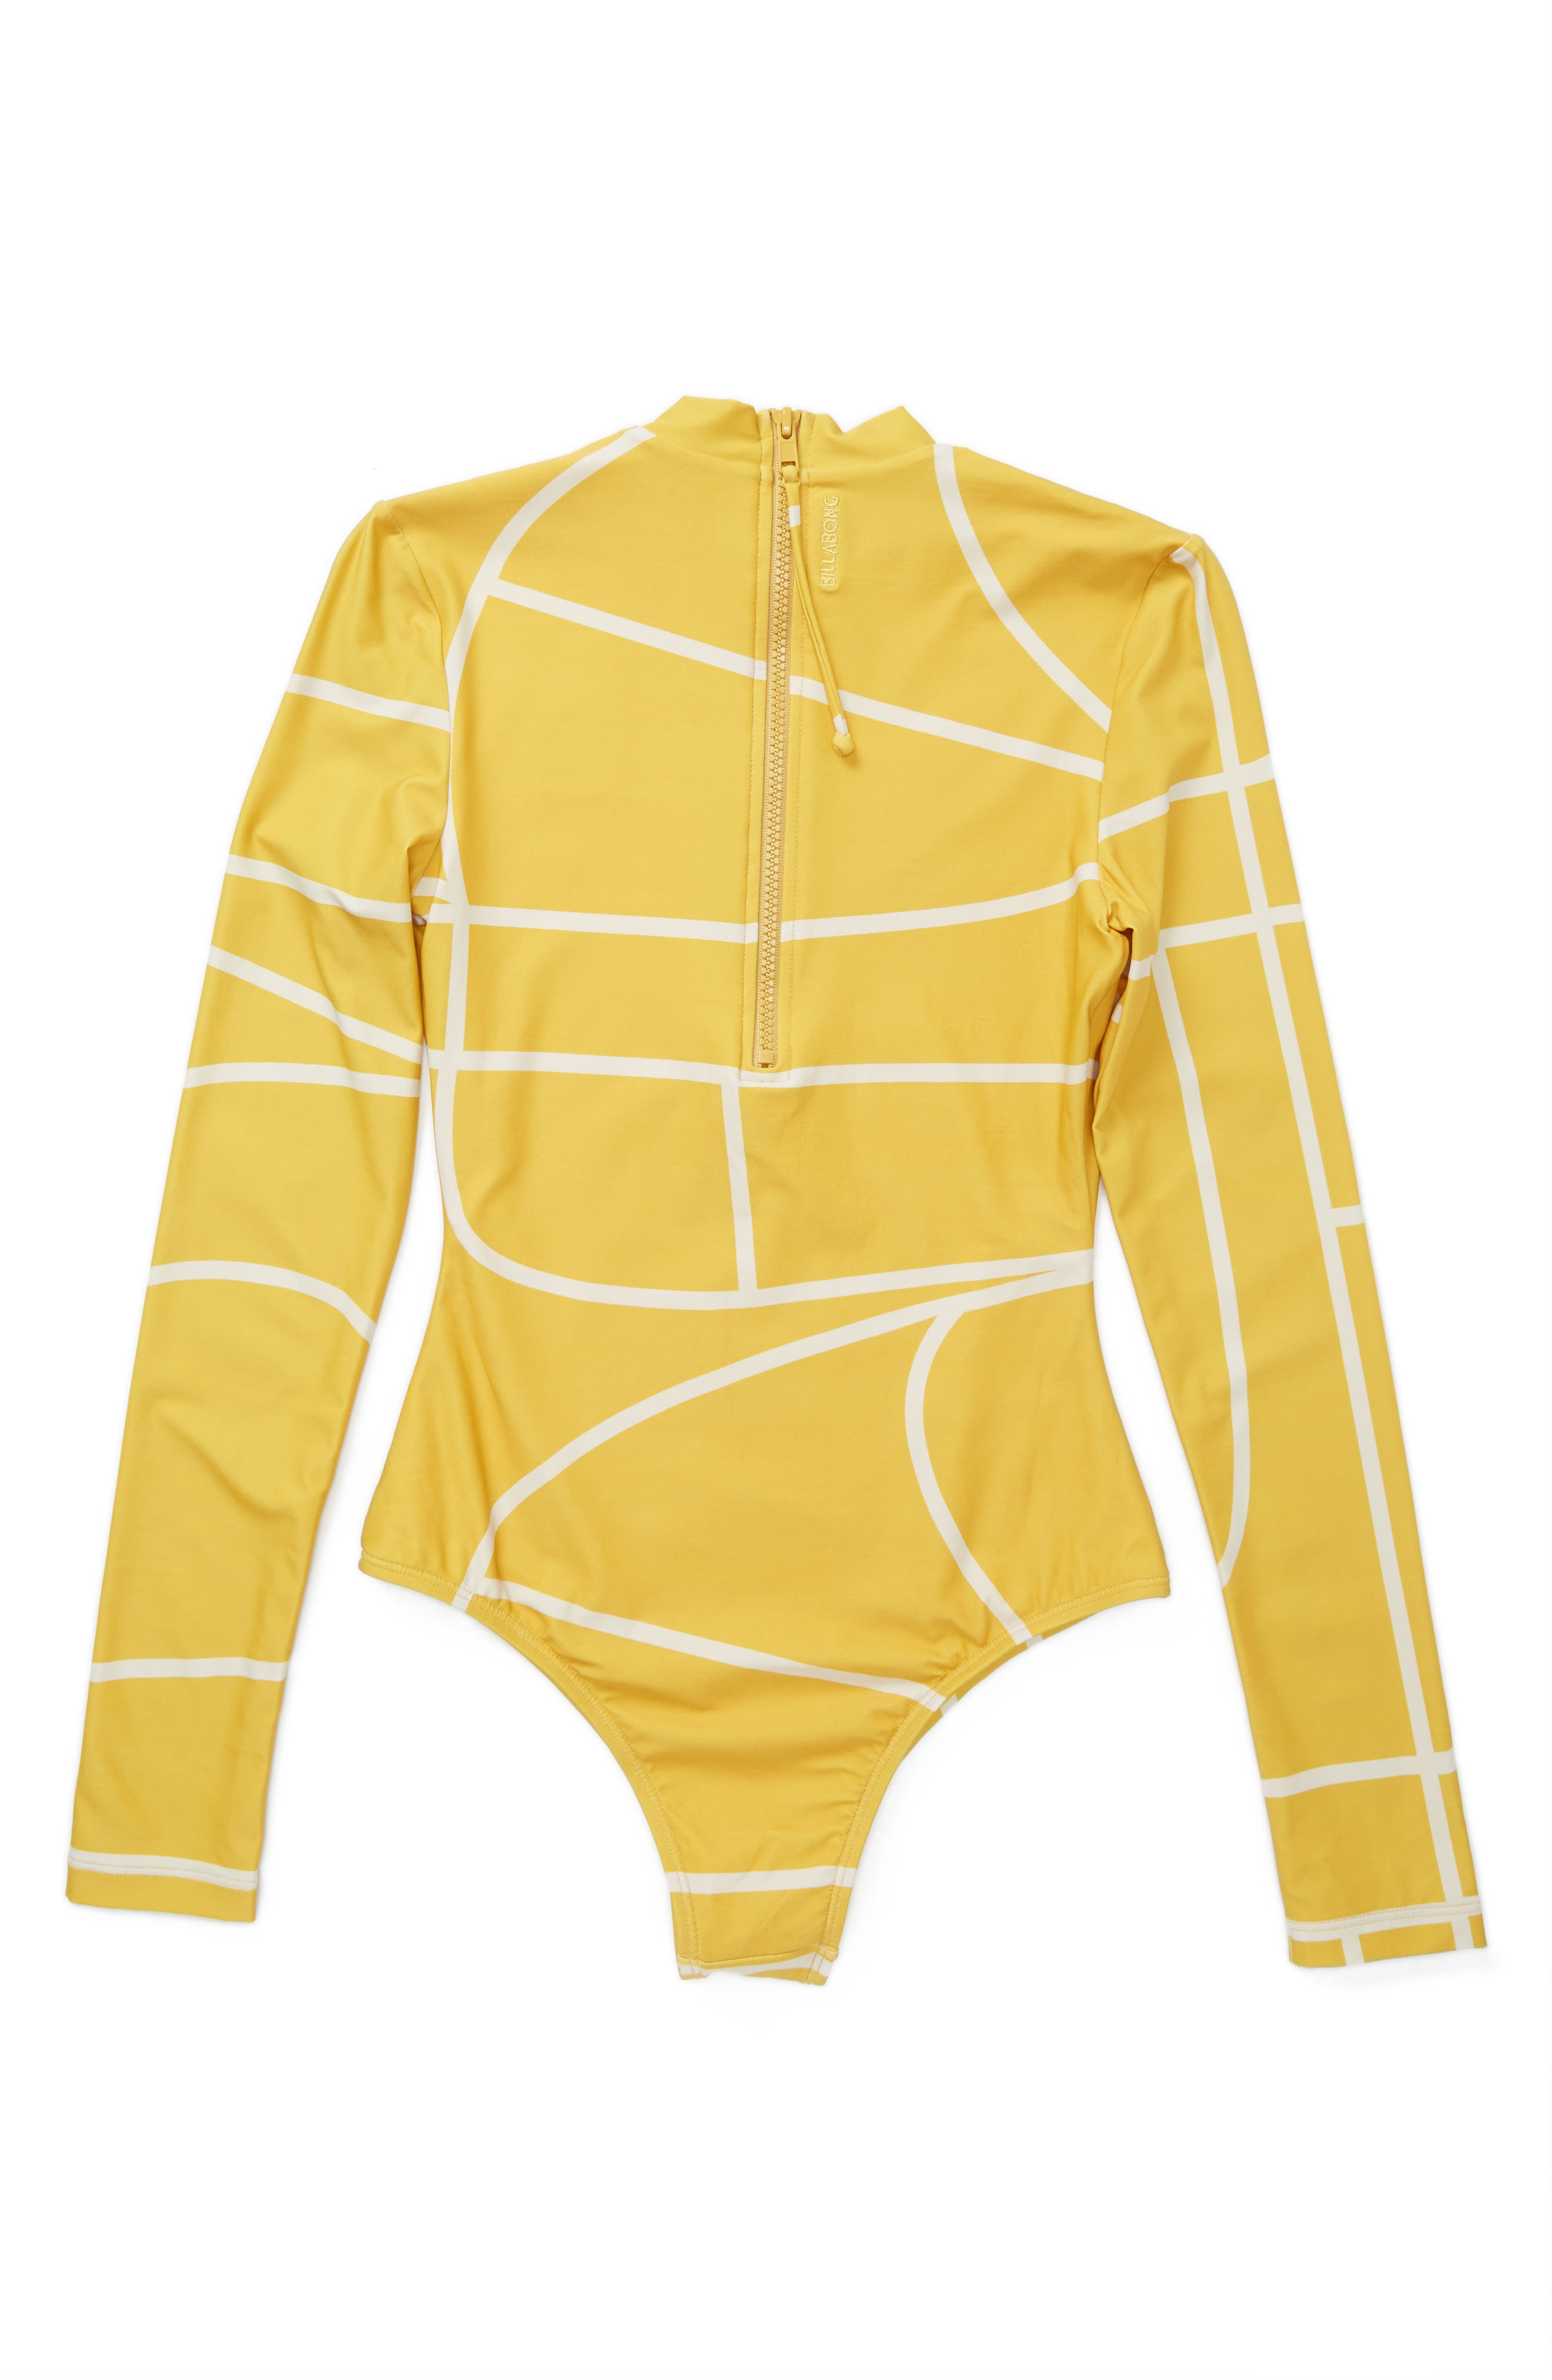 Babylon Rashguard Bodysuit,                             Alternate thumbnail 3, color,                             710